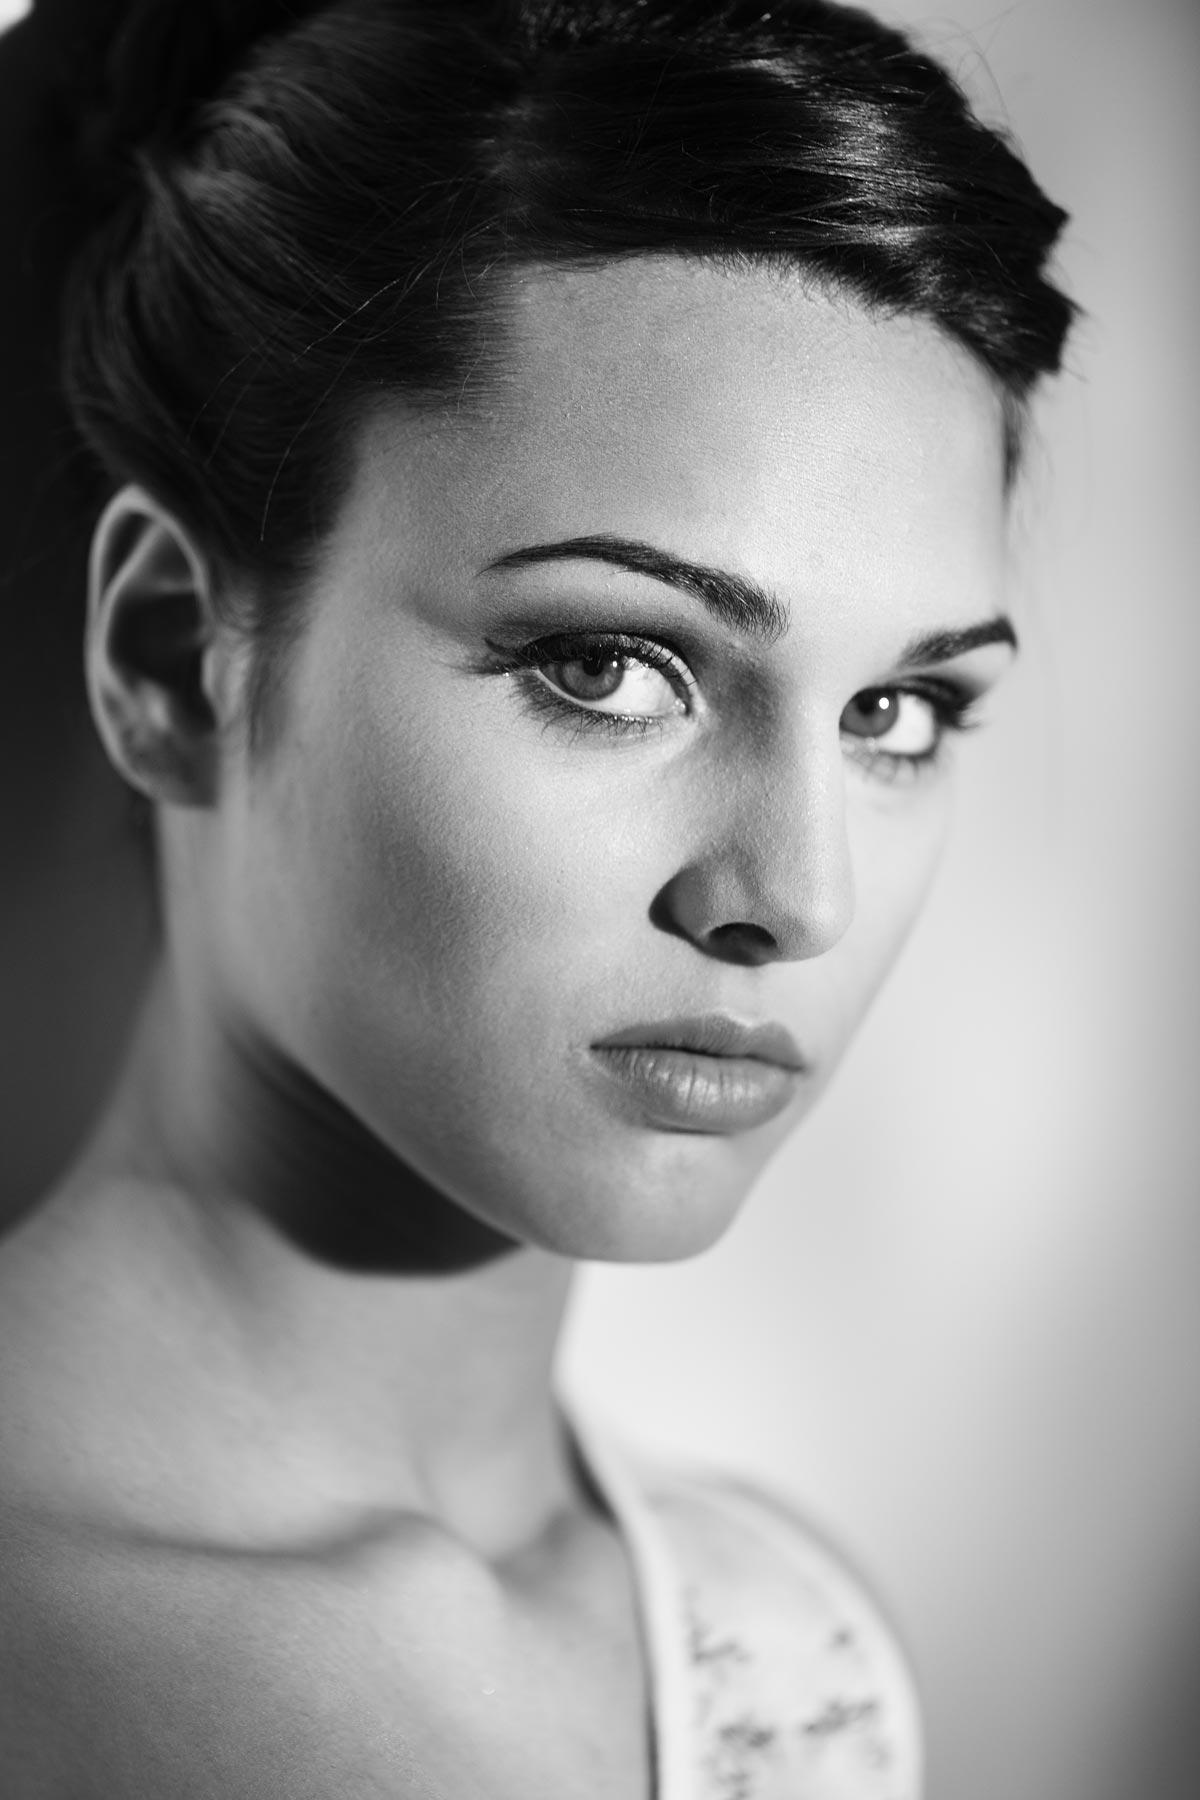 Tiffany shot in Stuttgart by Damien Lovegrove.